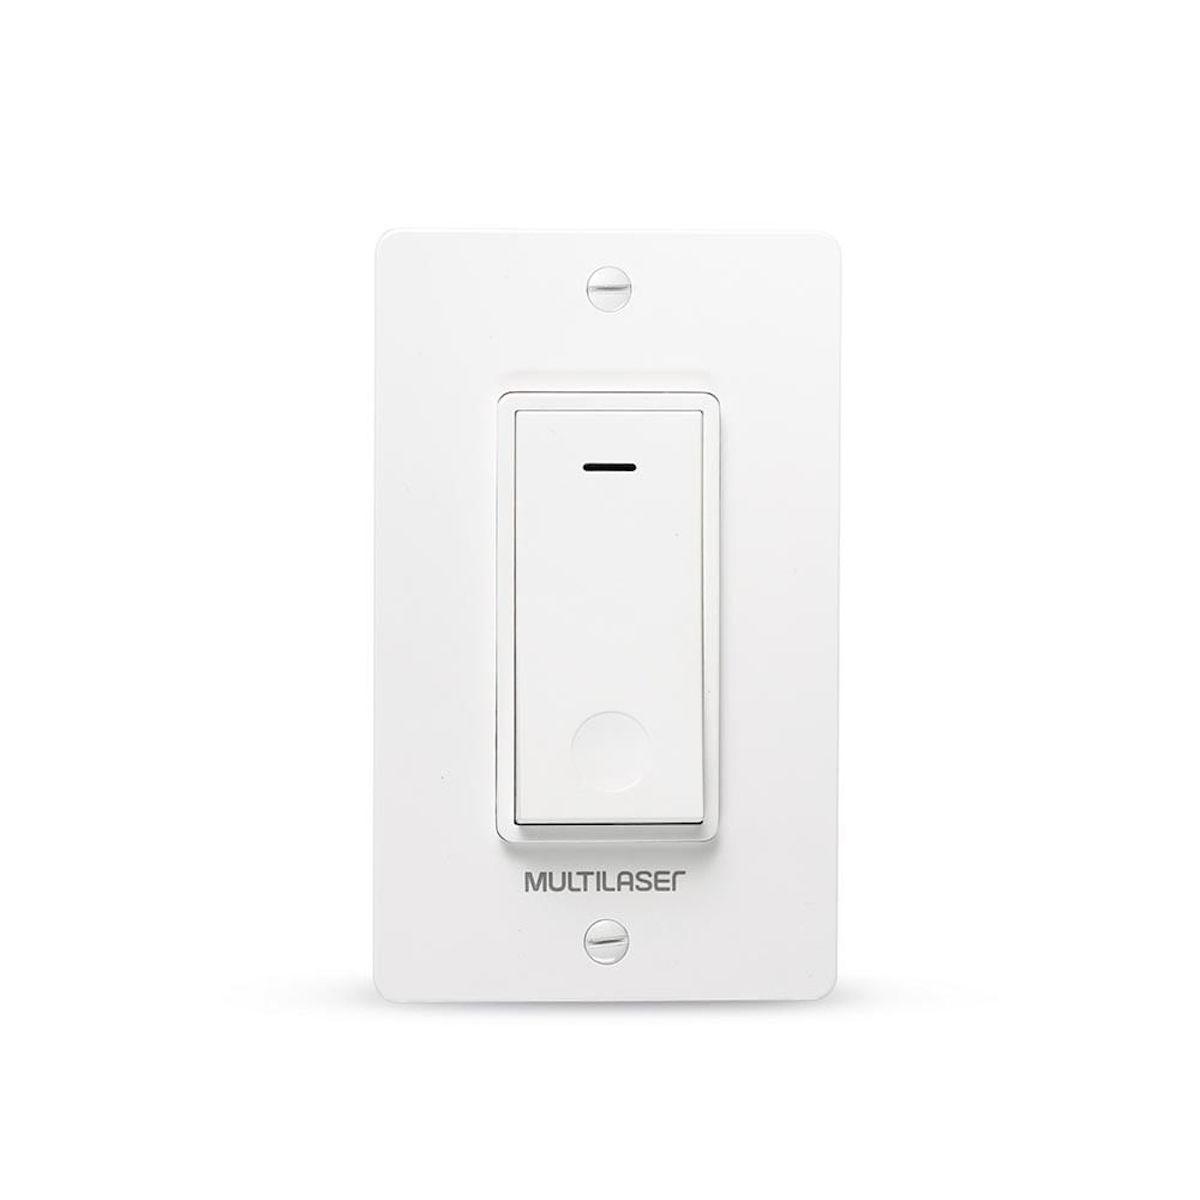 Interruptor Inteligente 1 Tecla Wi-Fi Liv - SE235 - Multilaser